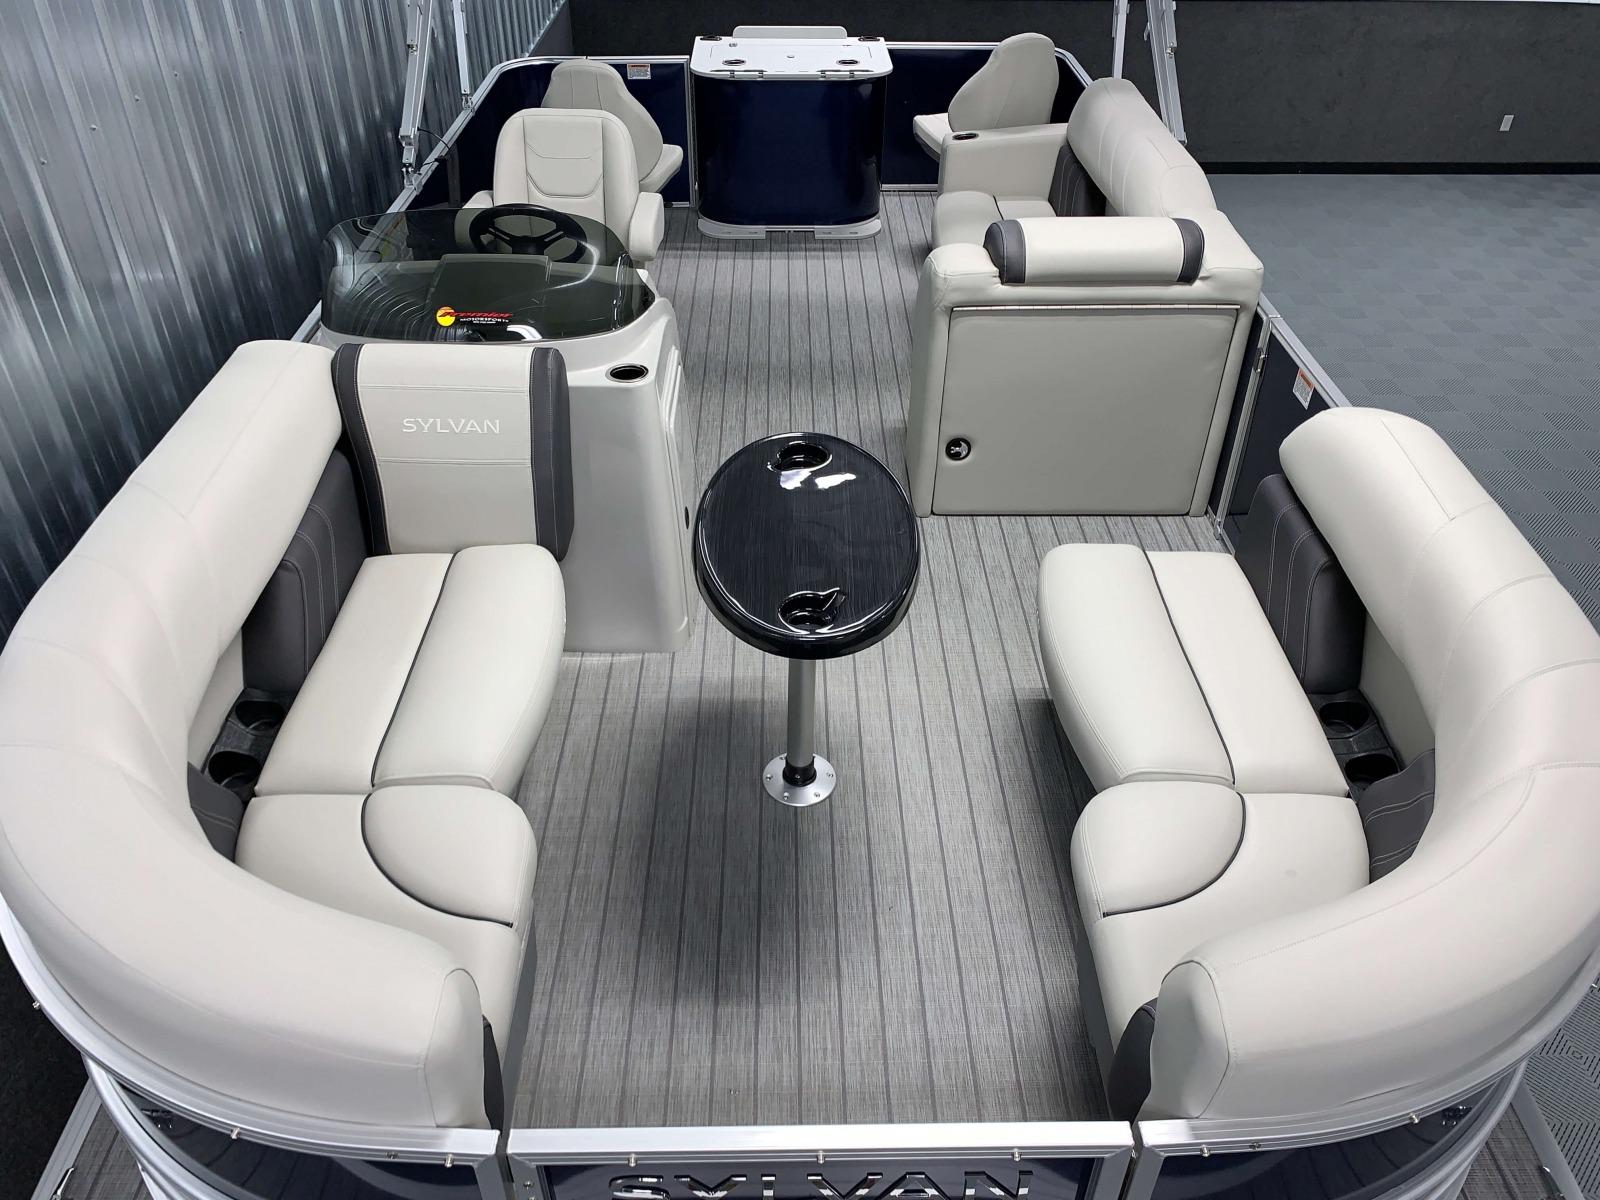 Teak Weave Vinyl Flooring of a 2021 Sylvan 8520 Party Fish Pontoon Boat